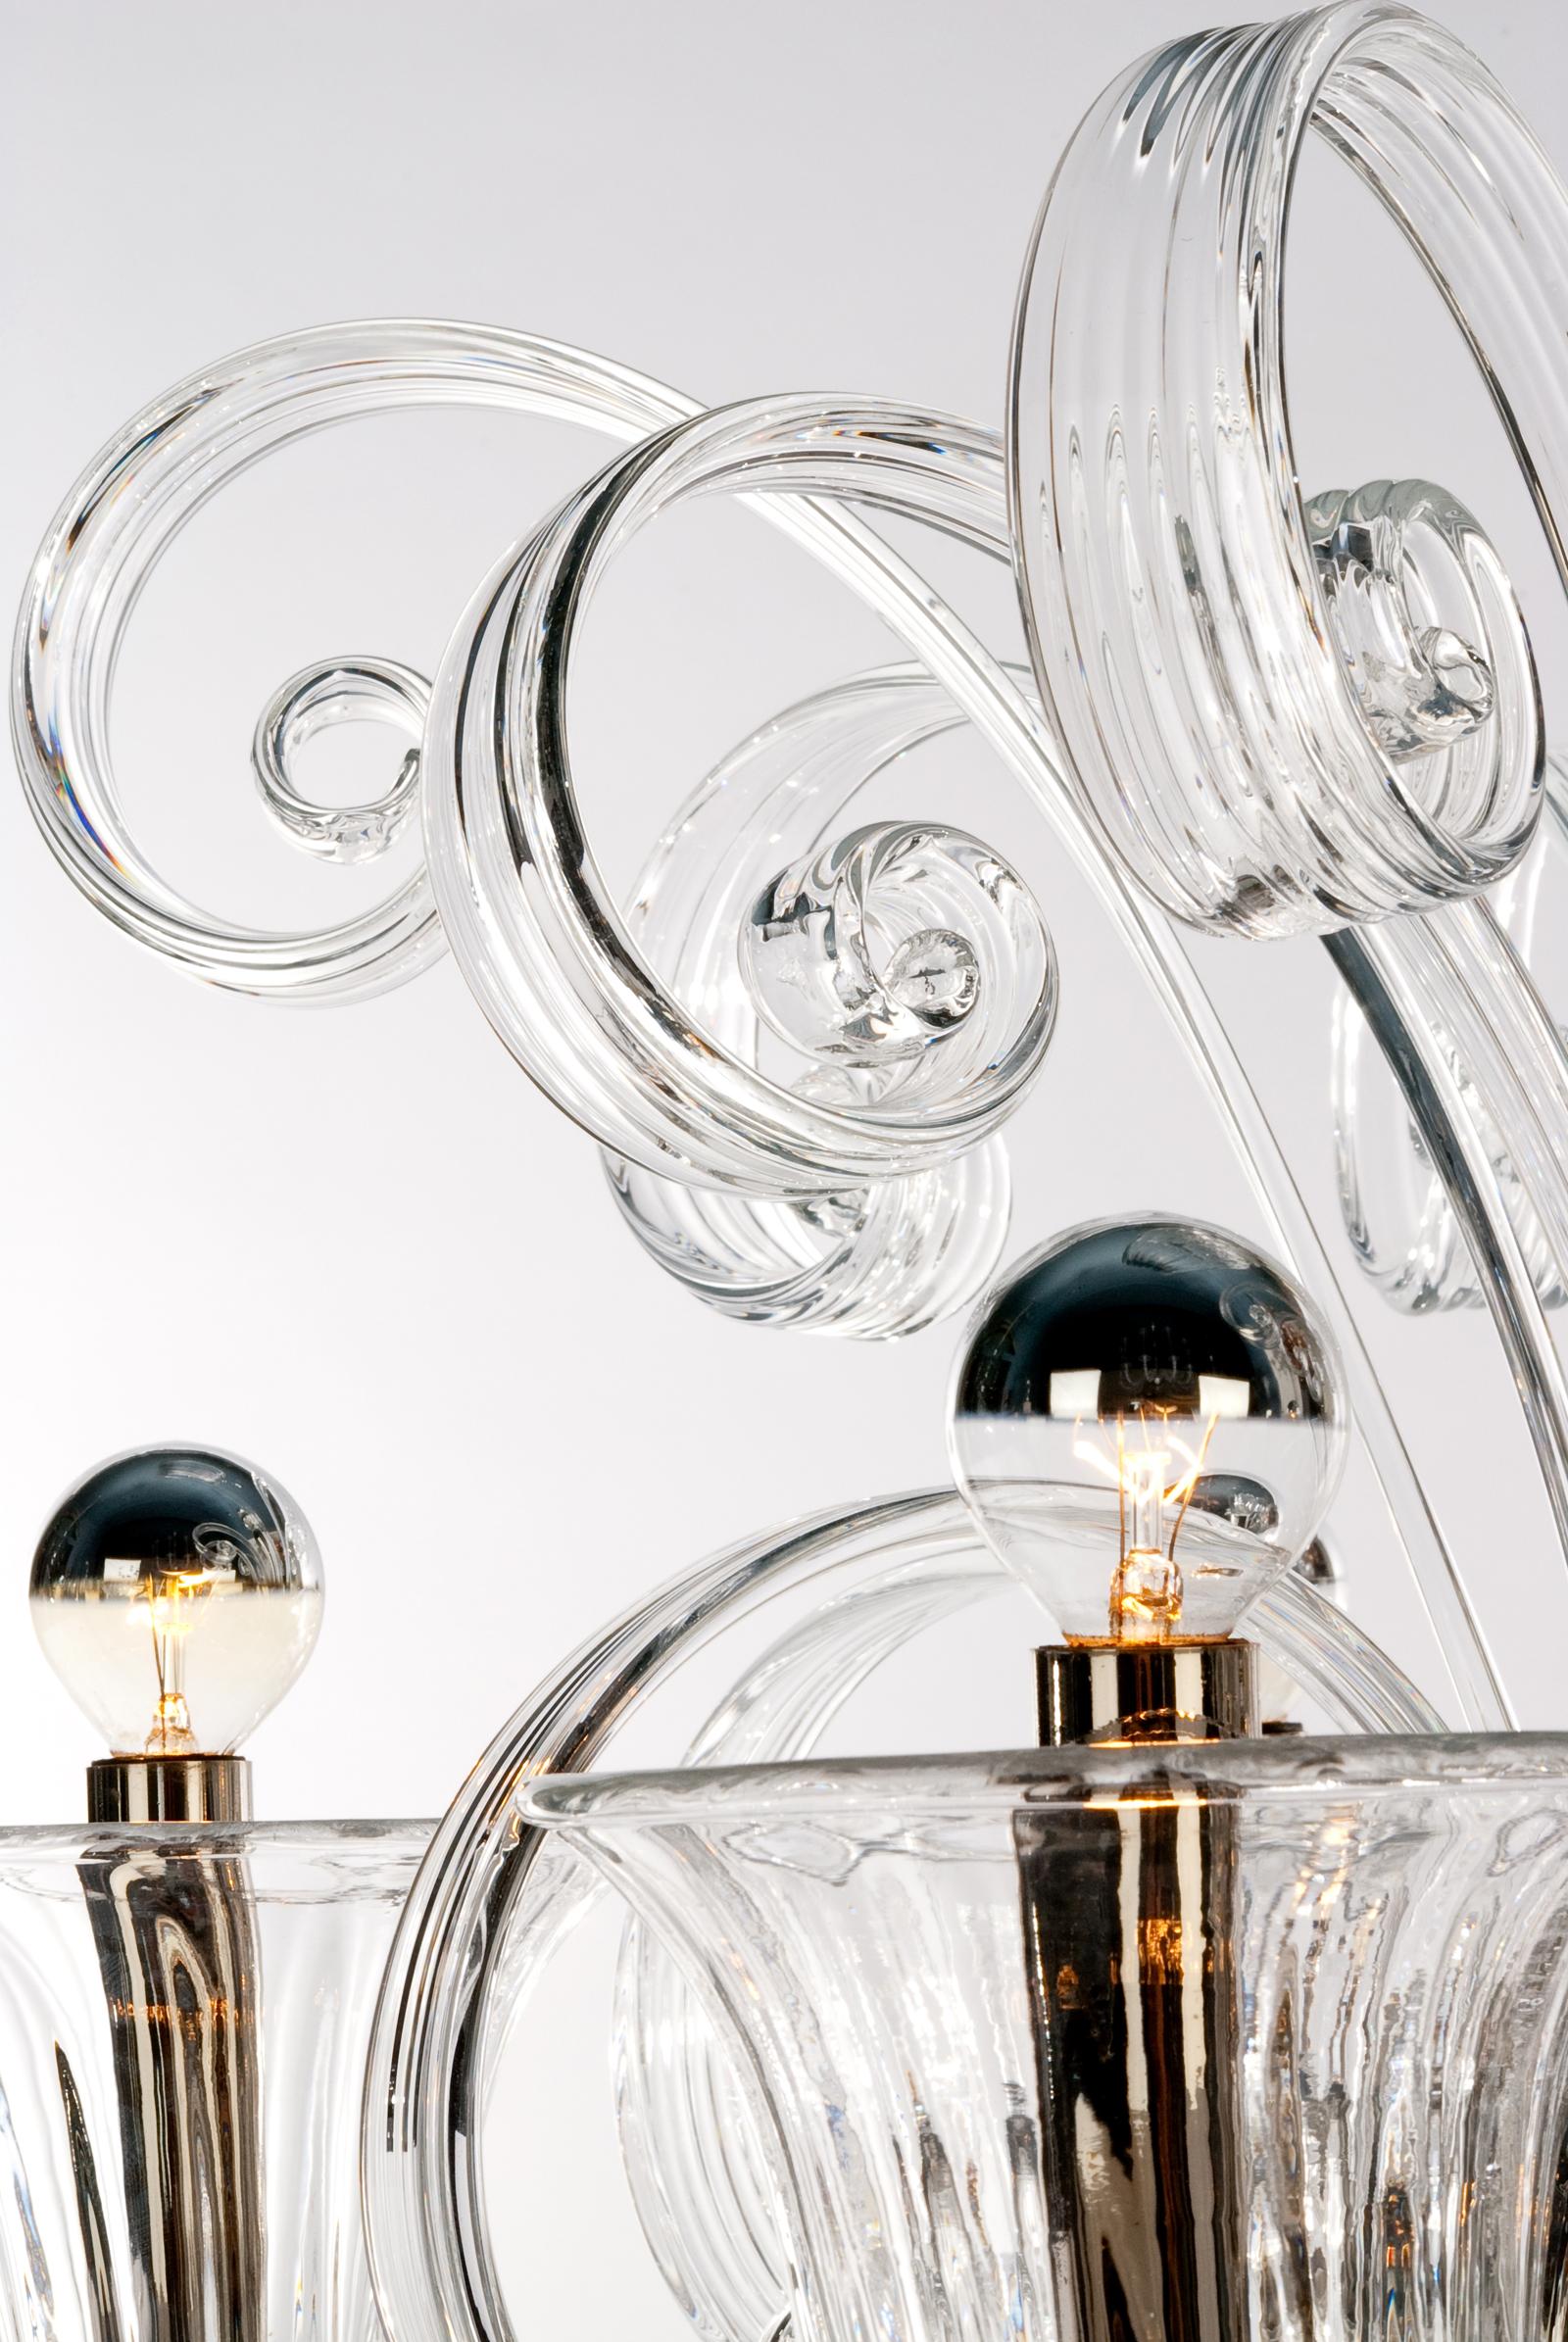 idole-floor-lamp-lampadaire-ute-wegener-didier-masquida-veronese-3.jpg